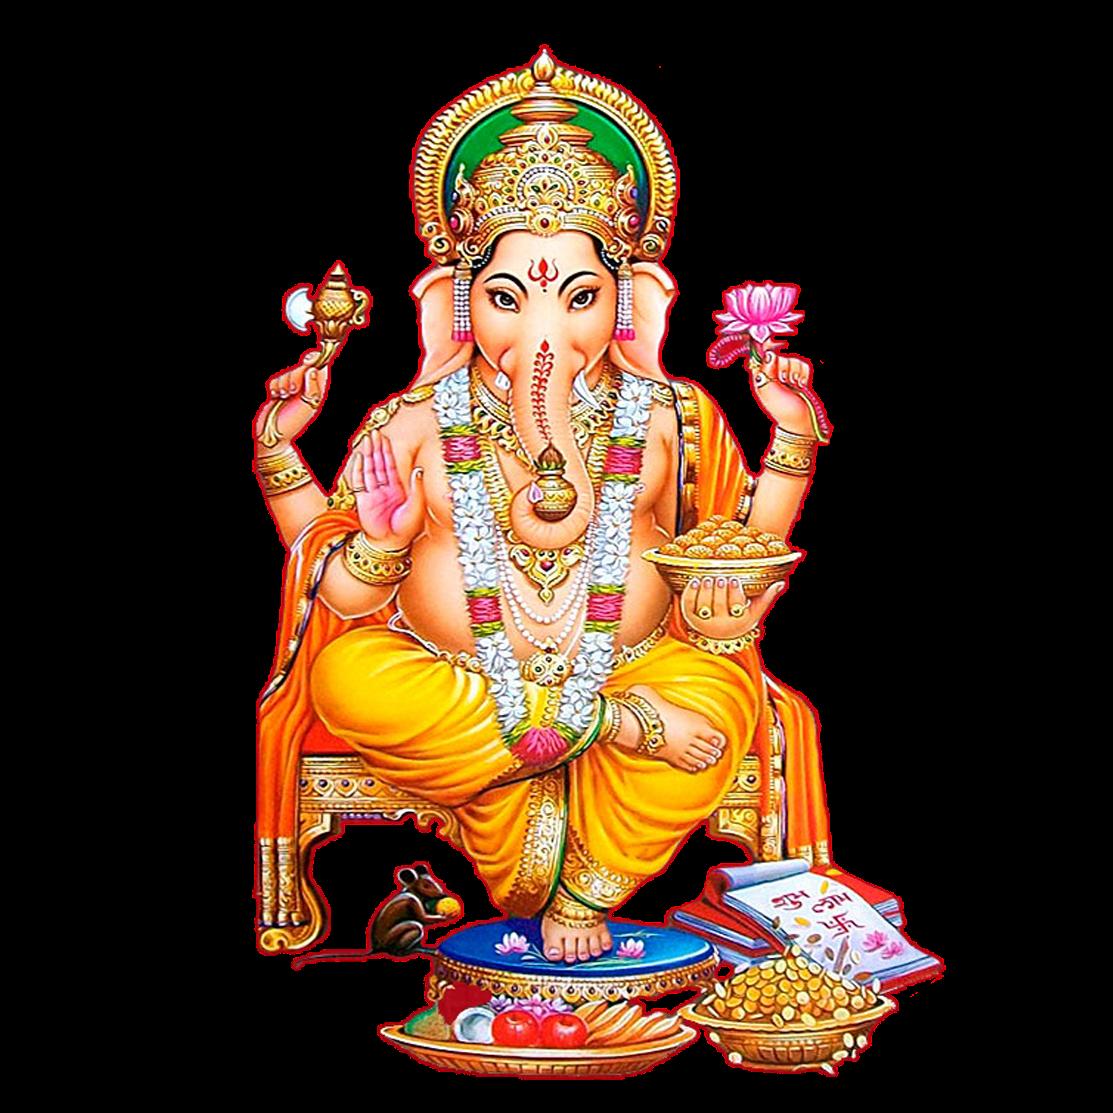 Lord Ganesha Png And Lord Ganesha Transparent Clipart Free Naveengfx In 2020 Ganesh Photo Psd Free Photoshop Ganesh Images